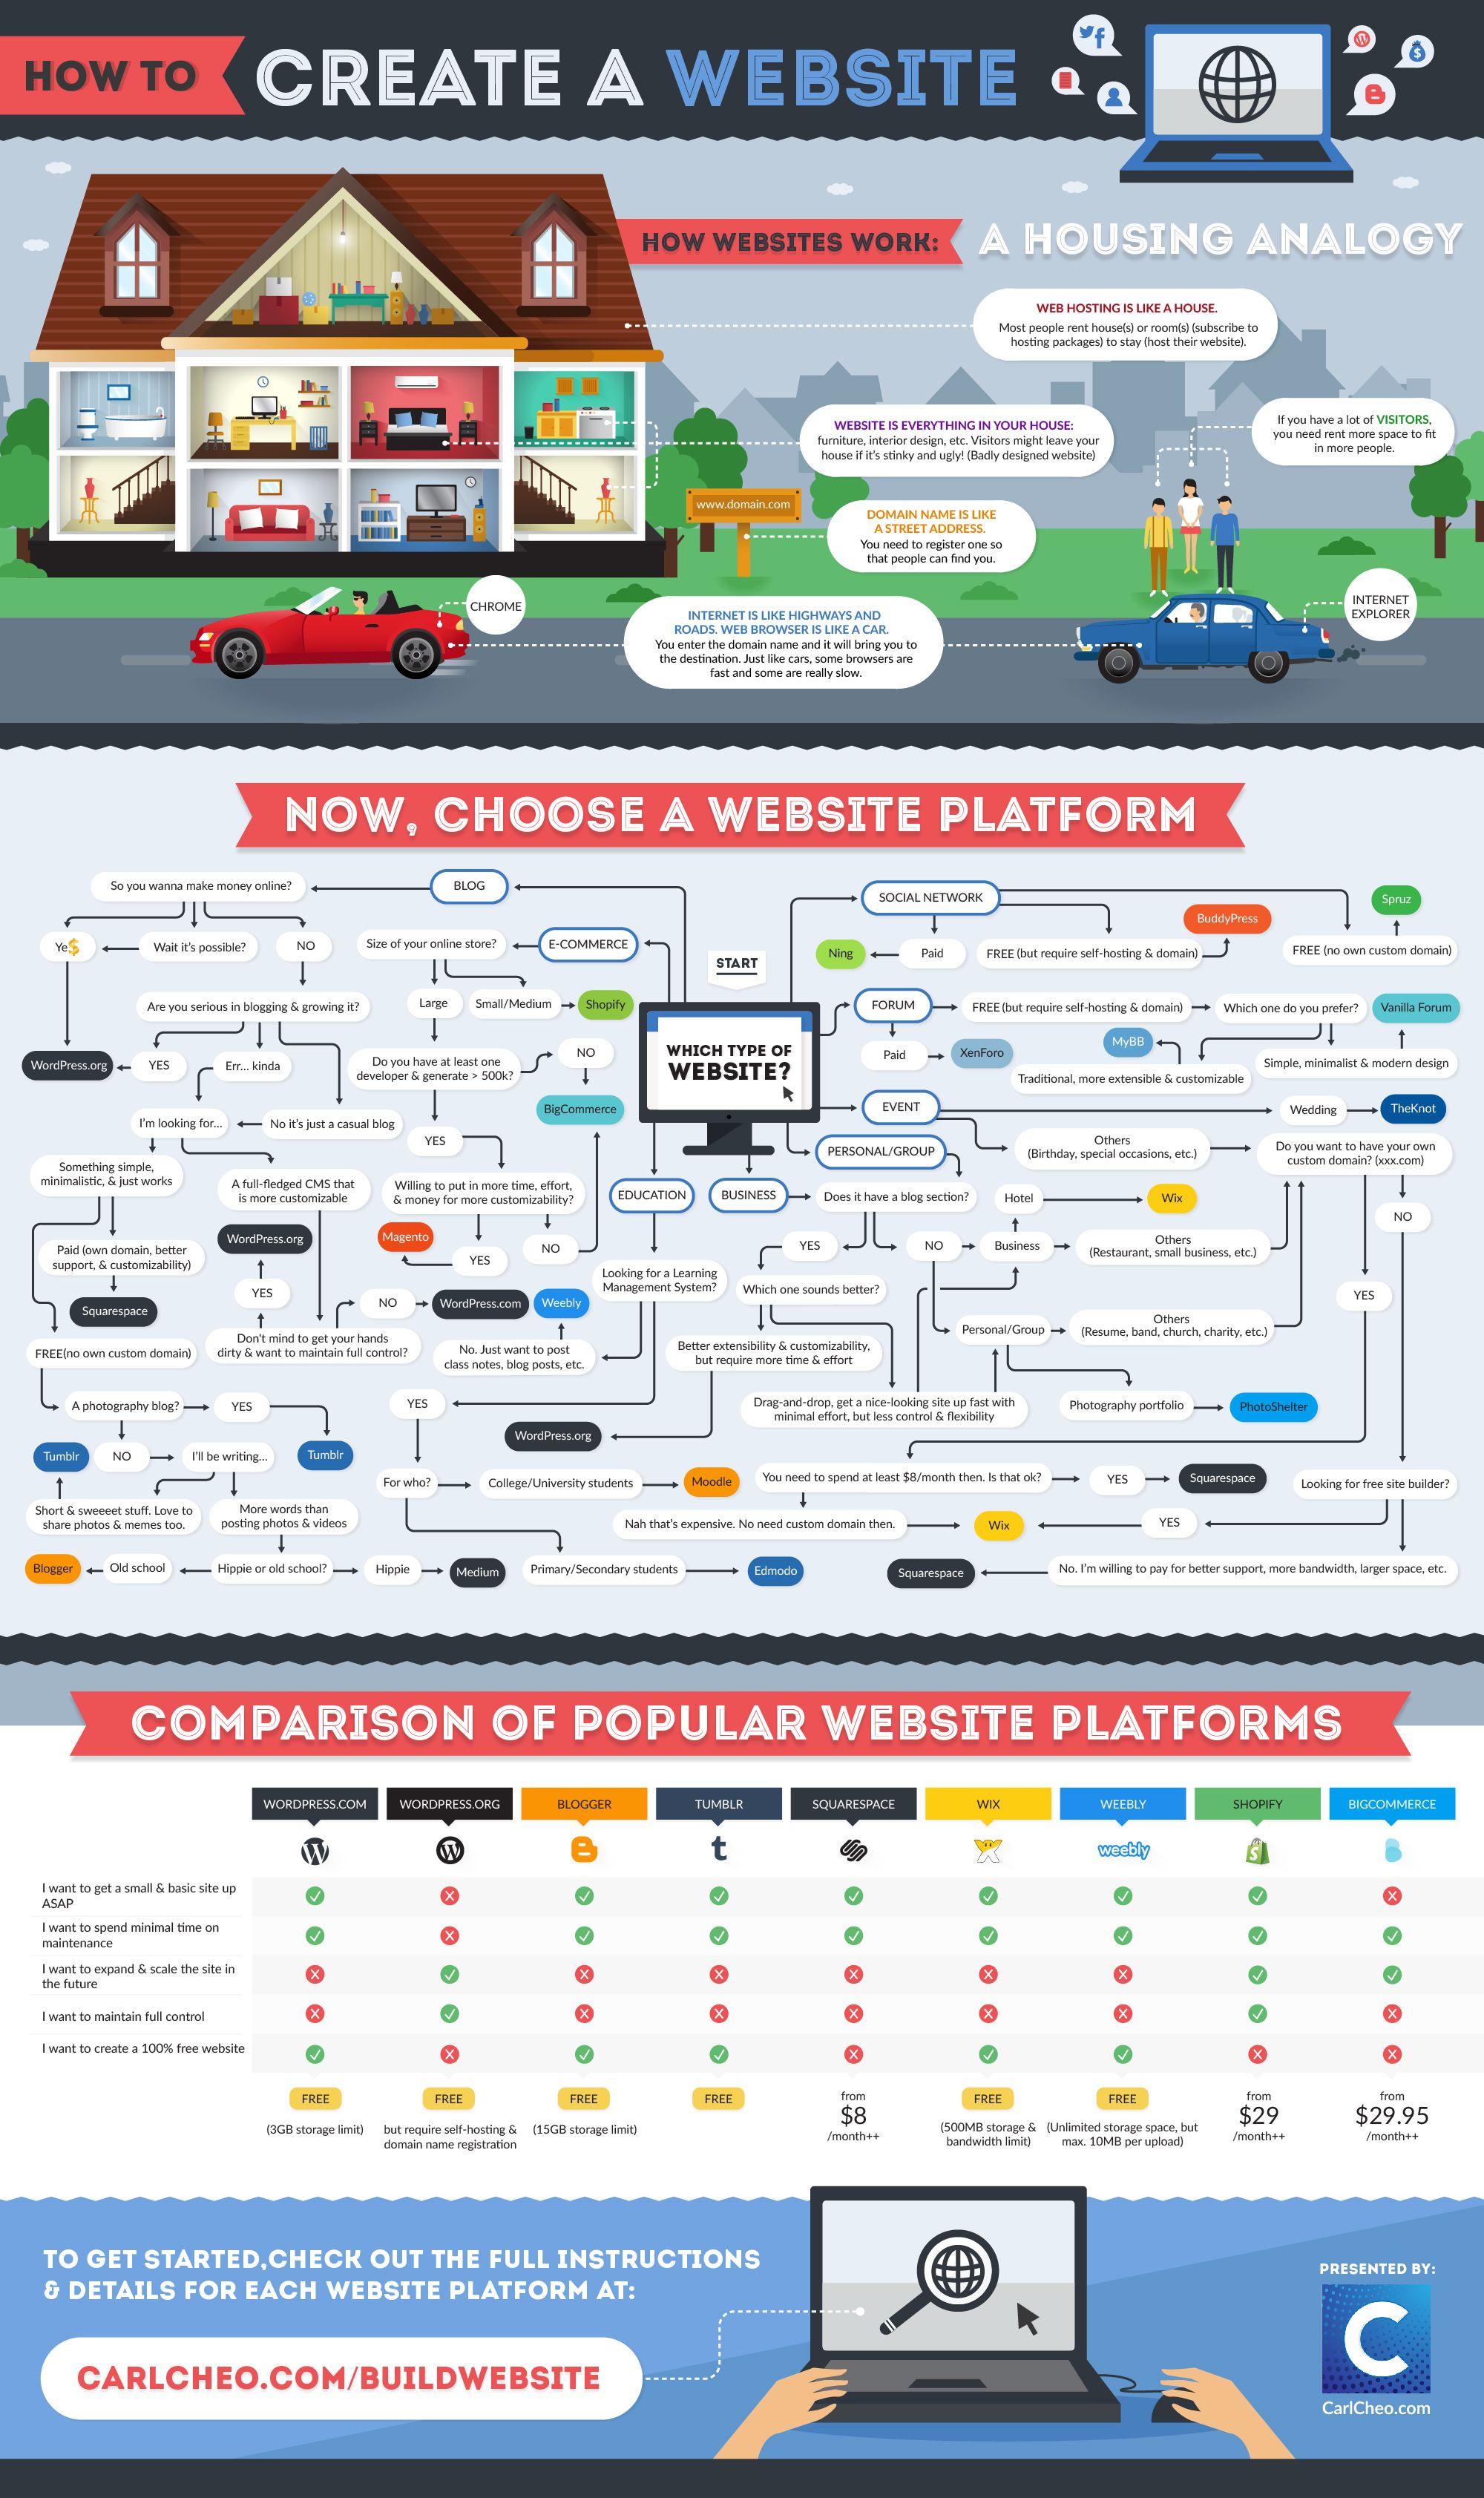 How To Create A Website The Definitive Beginner S Guide Infographic Web Design Tips Website Design Web Development Design